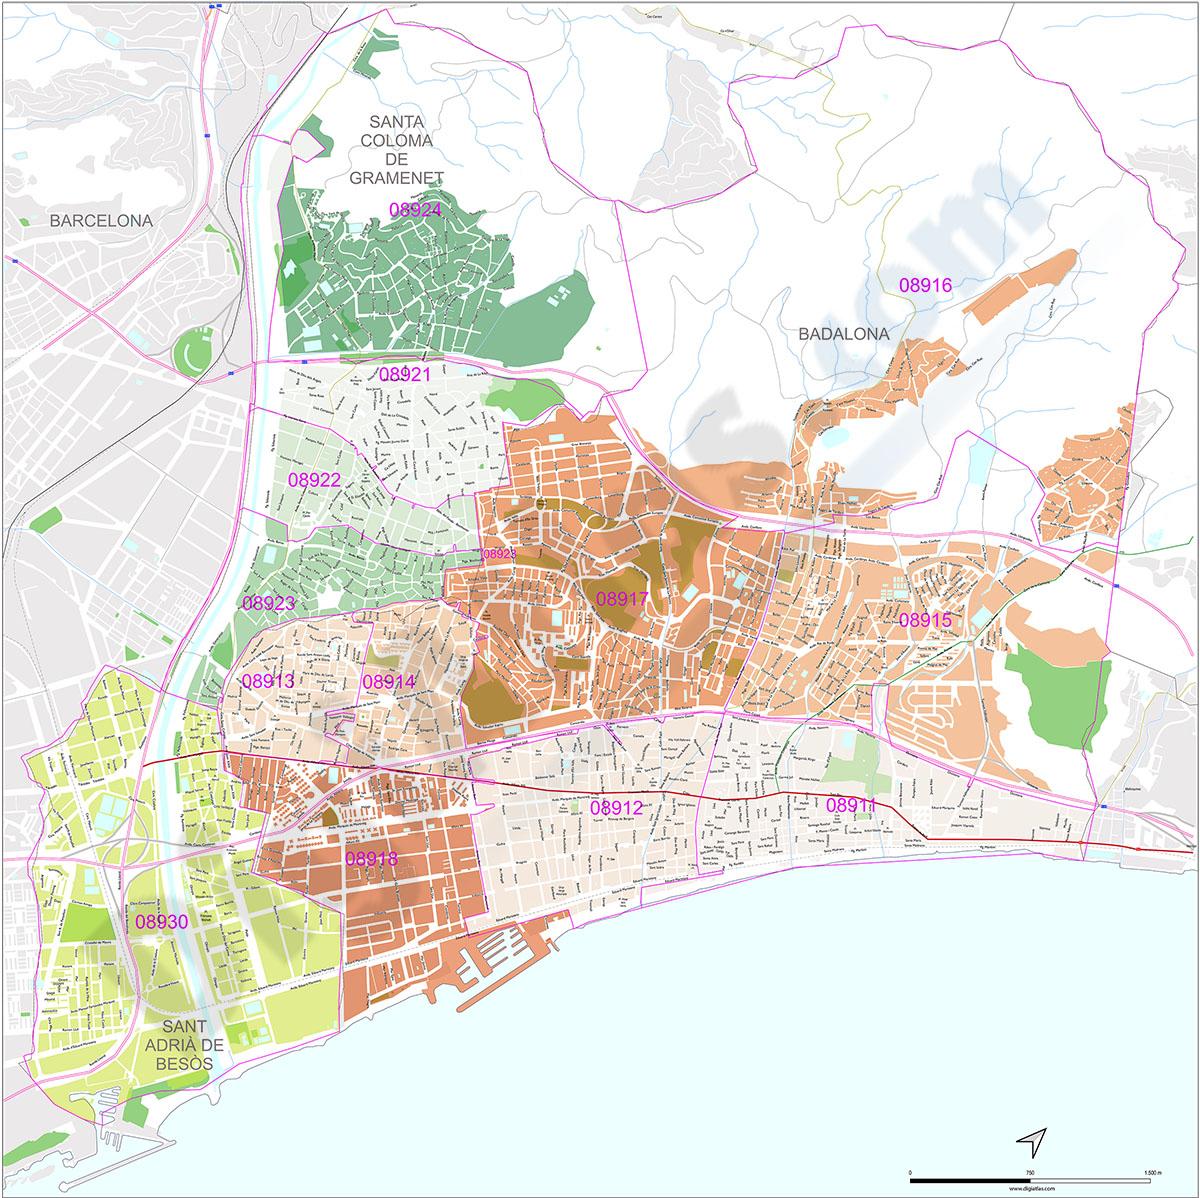 Badalona, Santa Coloma de Gramanet and Sant Adrià del Besòs with postal codes